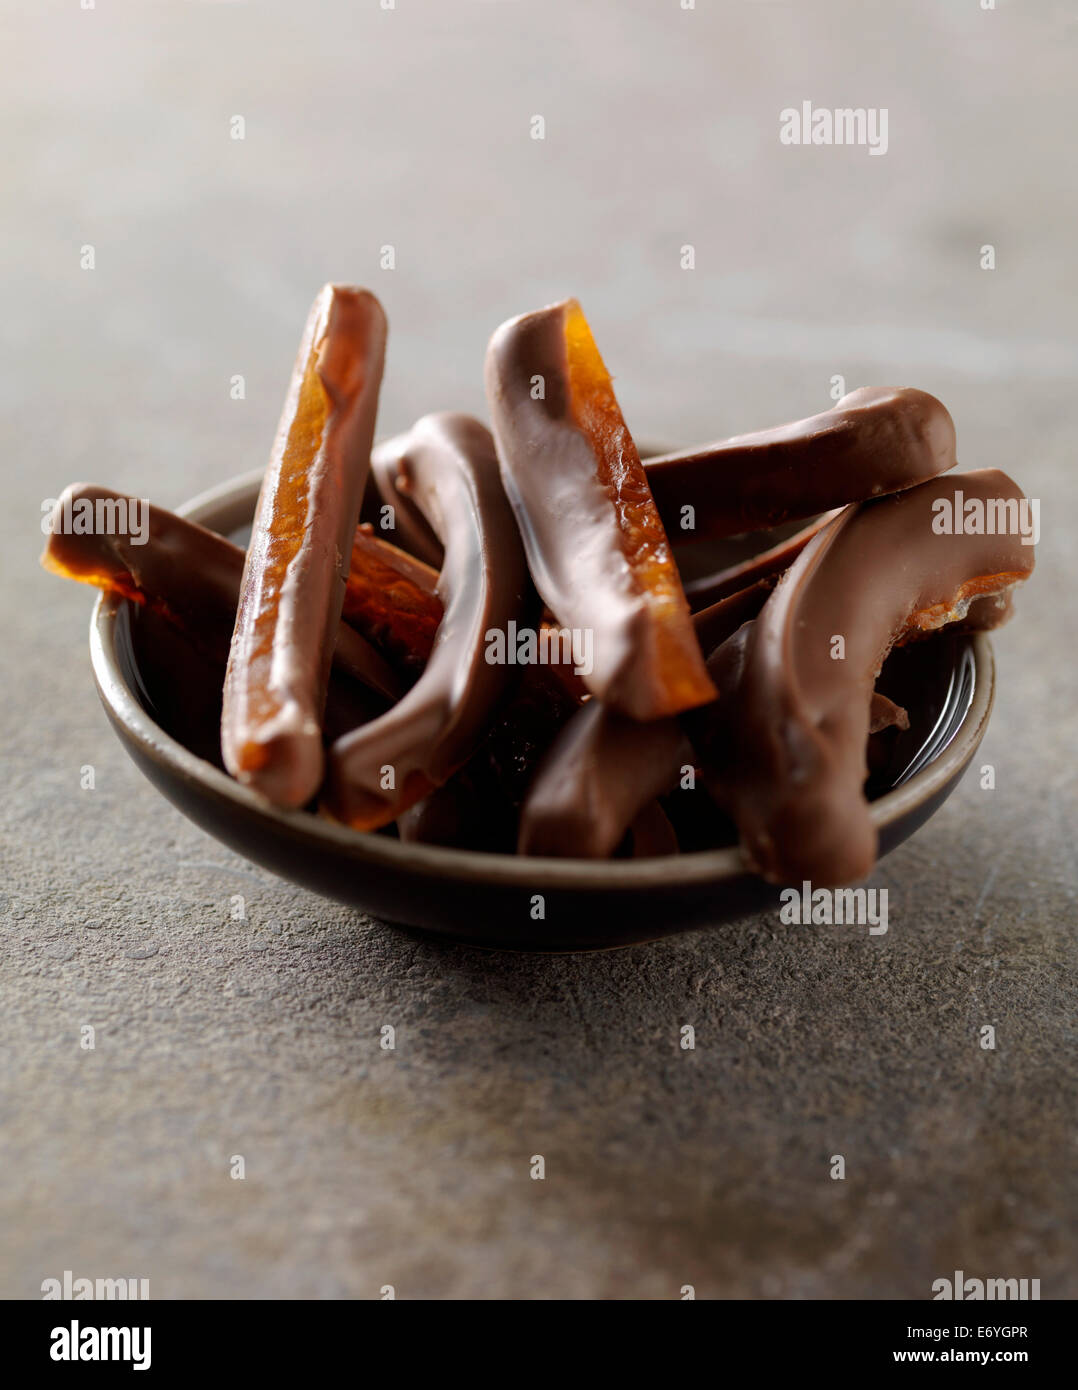 Grapefruit rinds coated in milk chocolate - Stock Image